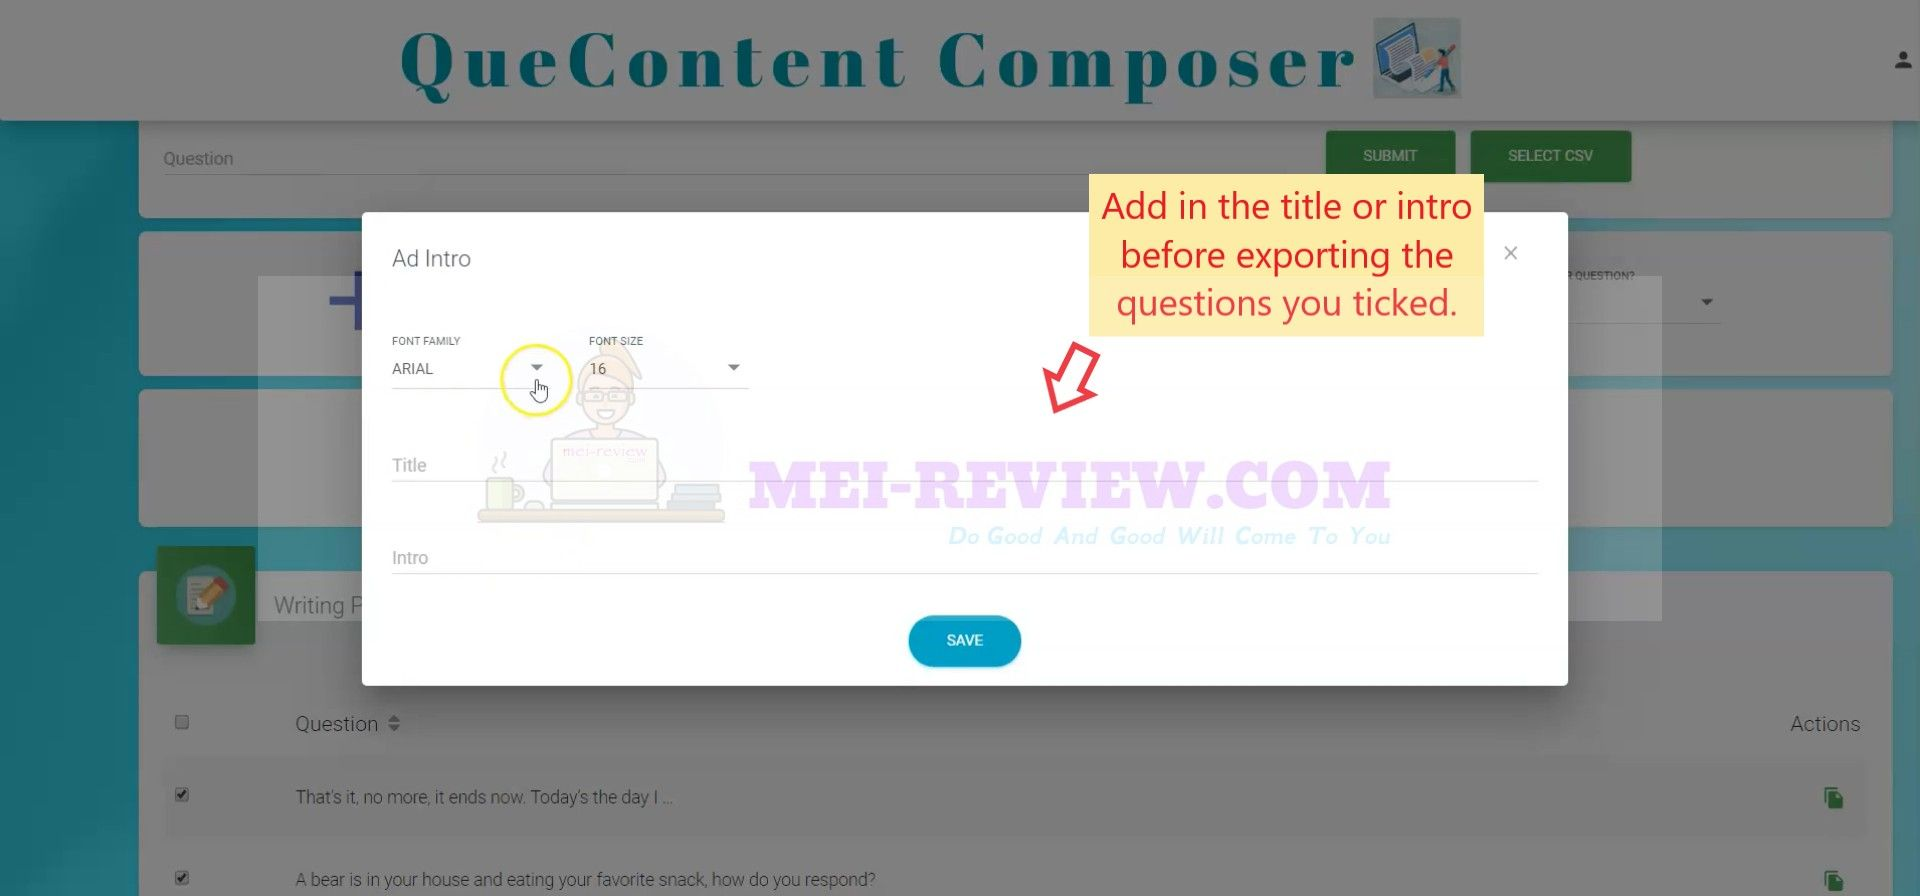 QueContent-Composer-how-to-use-6